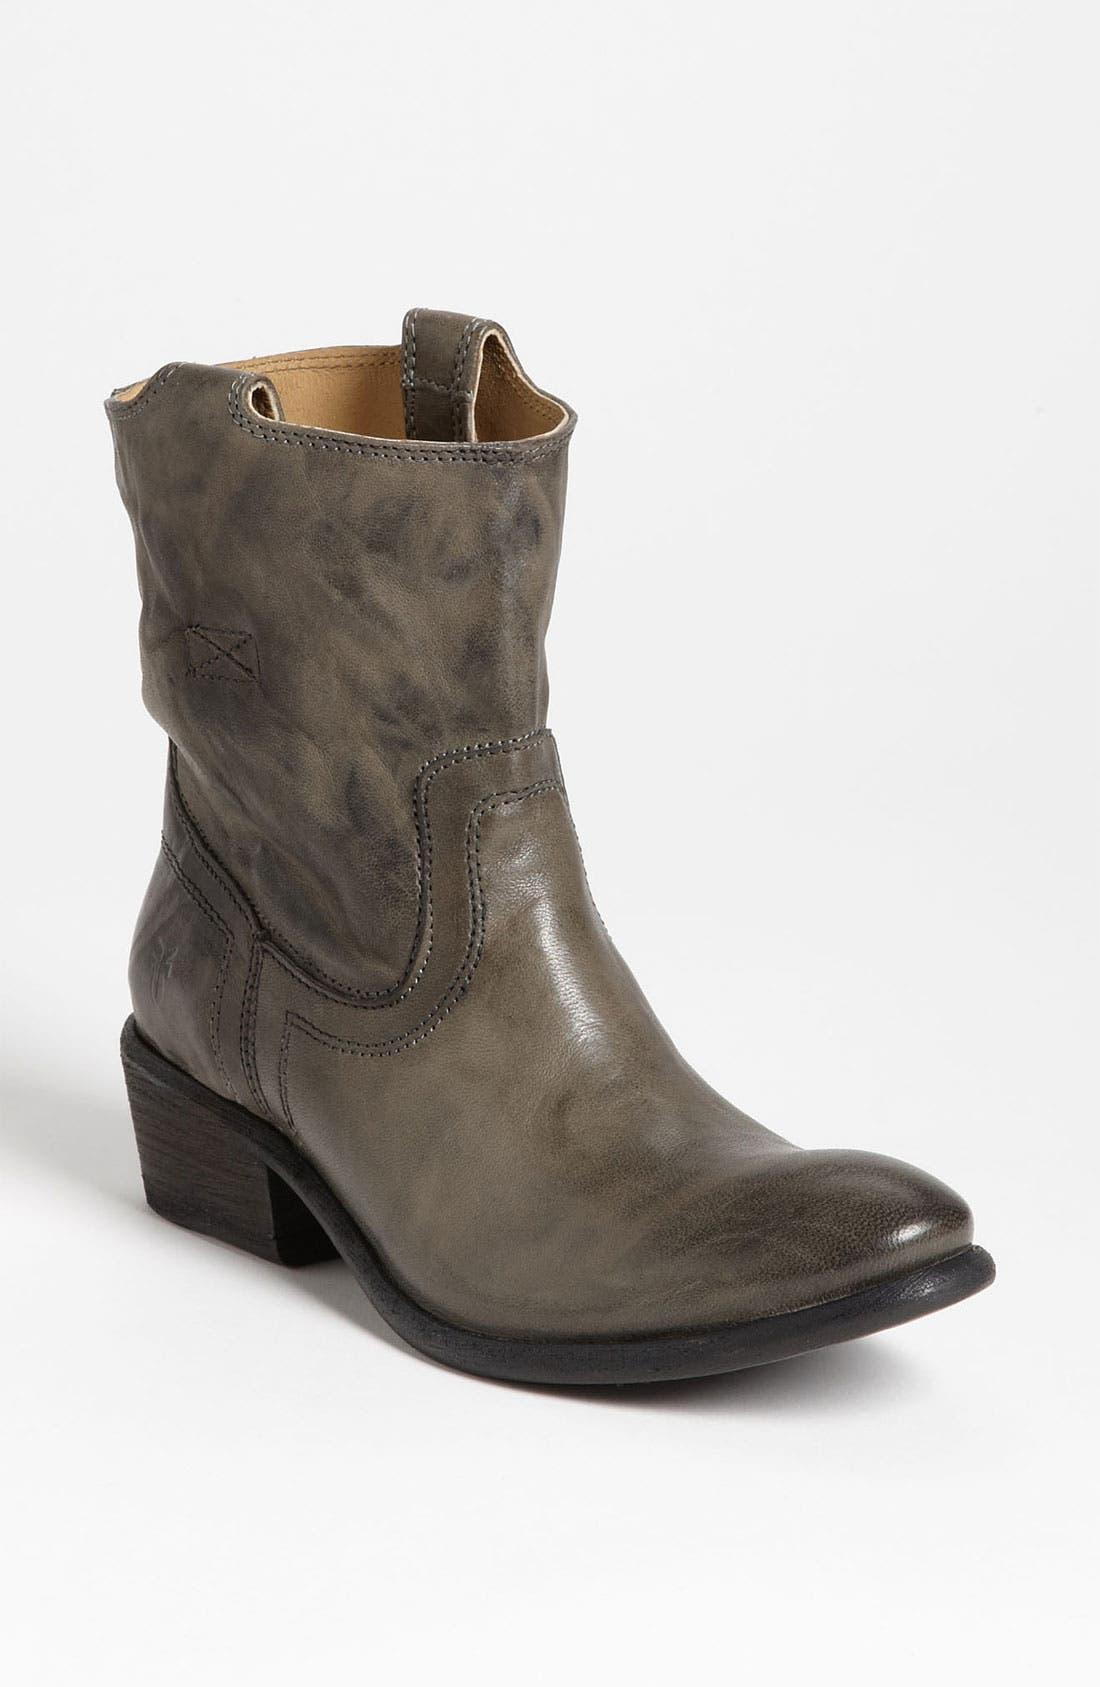 Main Image - Frye 'Carson Tab' Short Boot